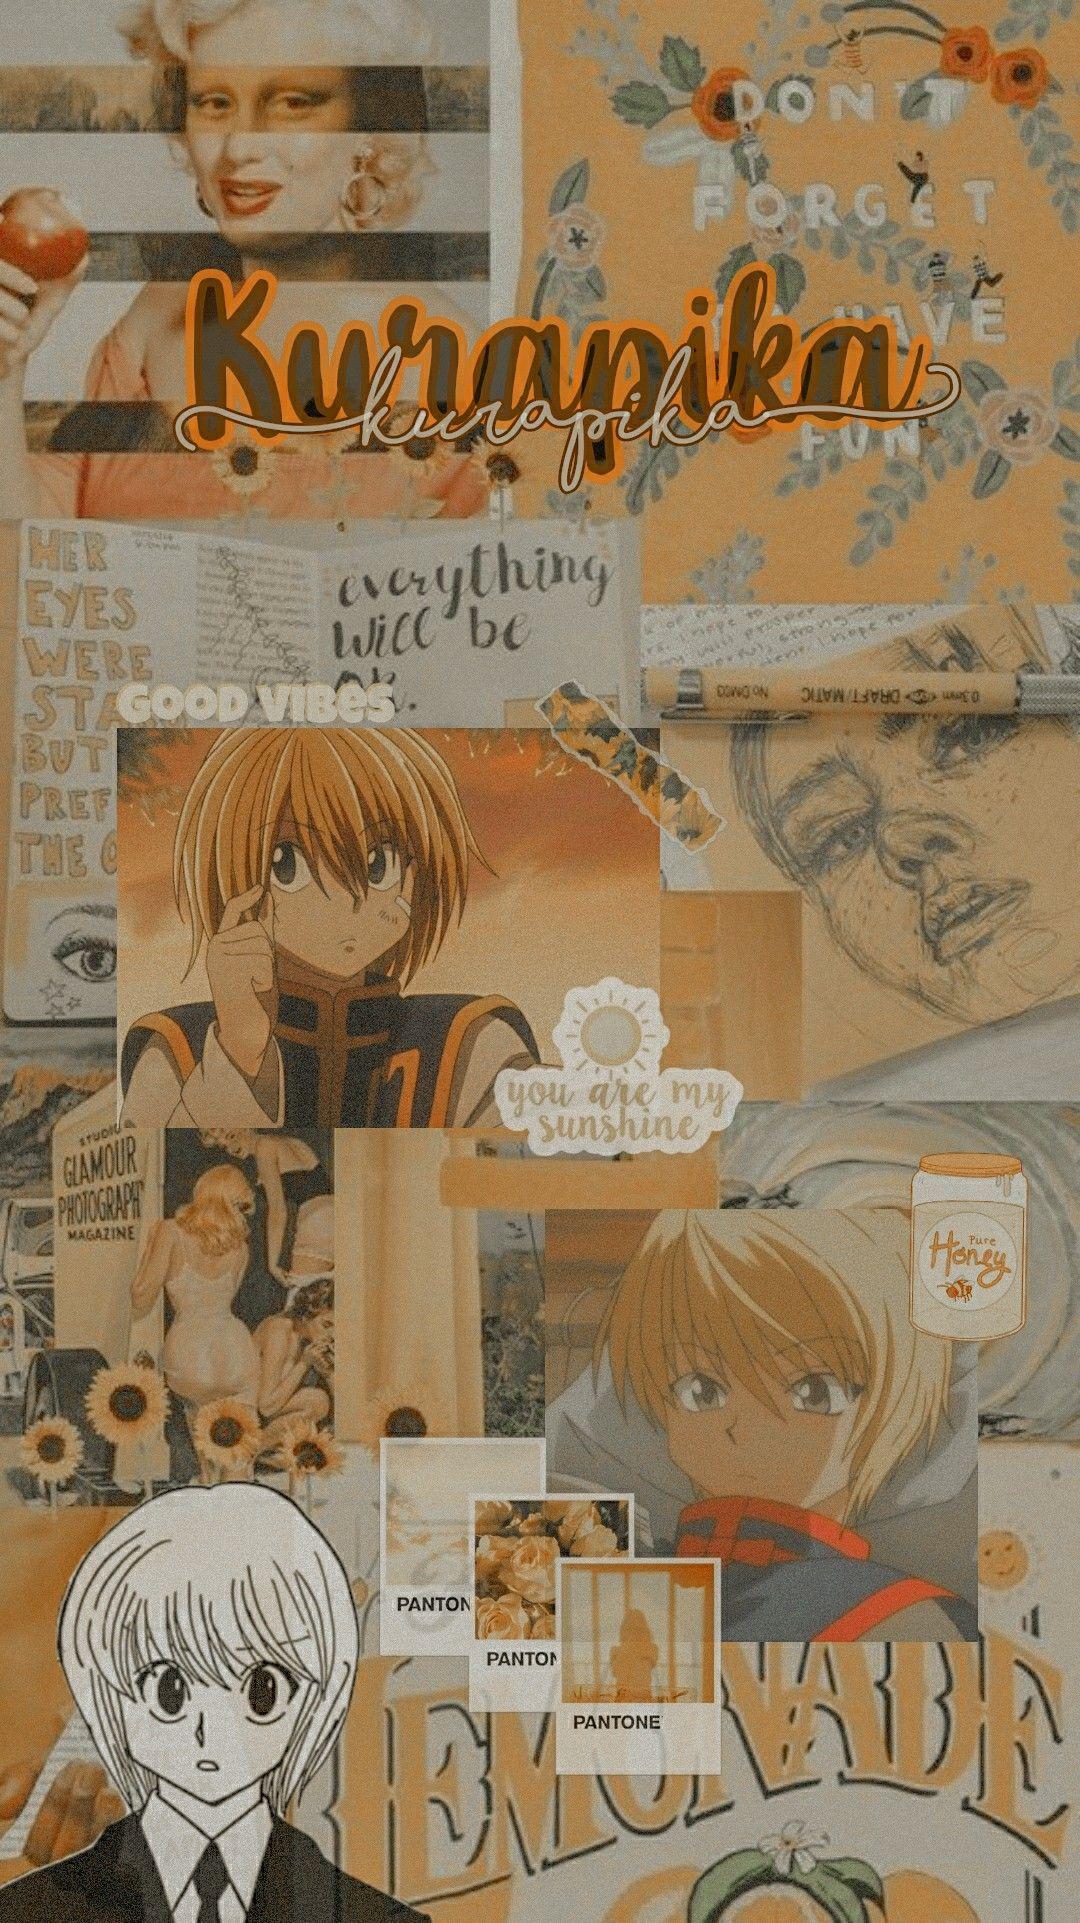 Kurapika Aesthetic Wallpaper Anime Wallpaper Phone Cute Anime Wallpaper Anime Wallpaper Iphone